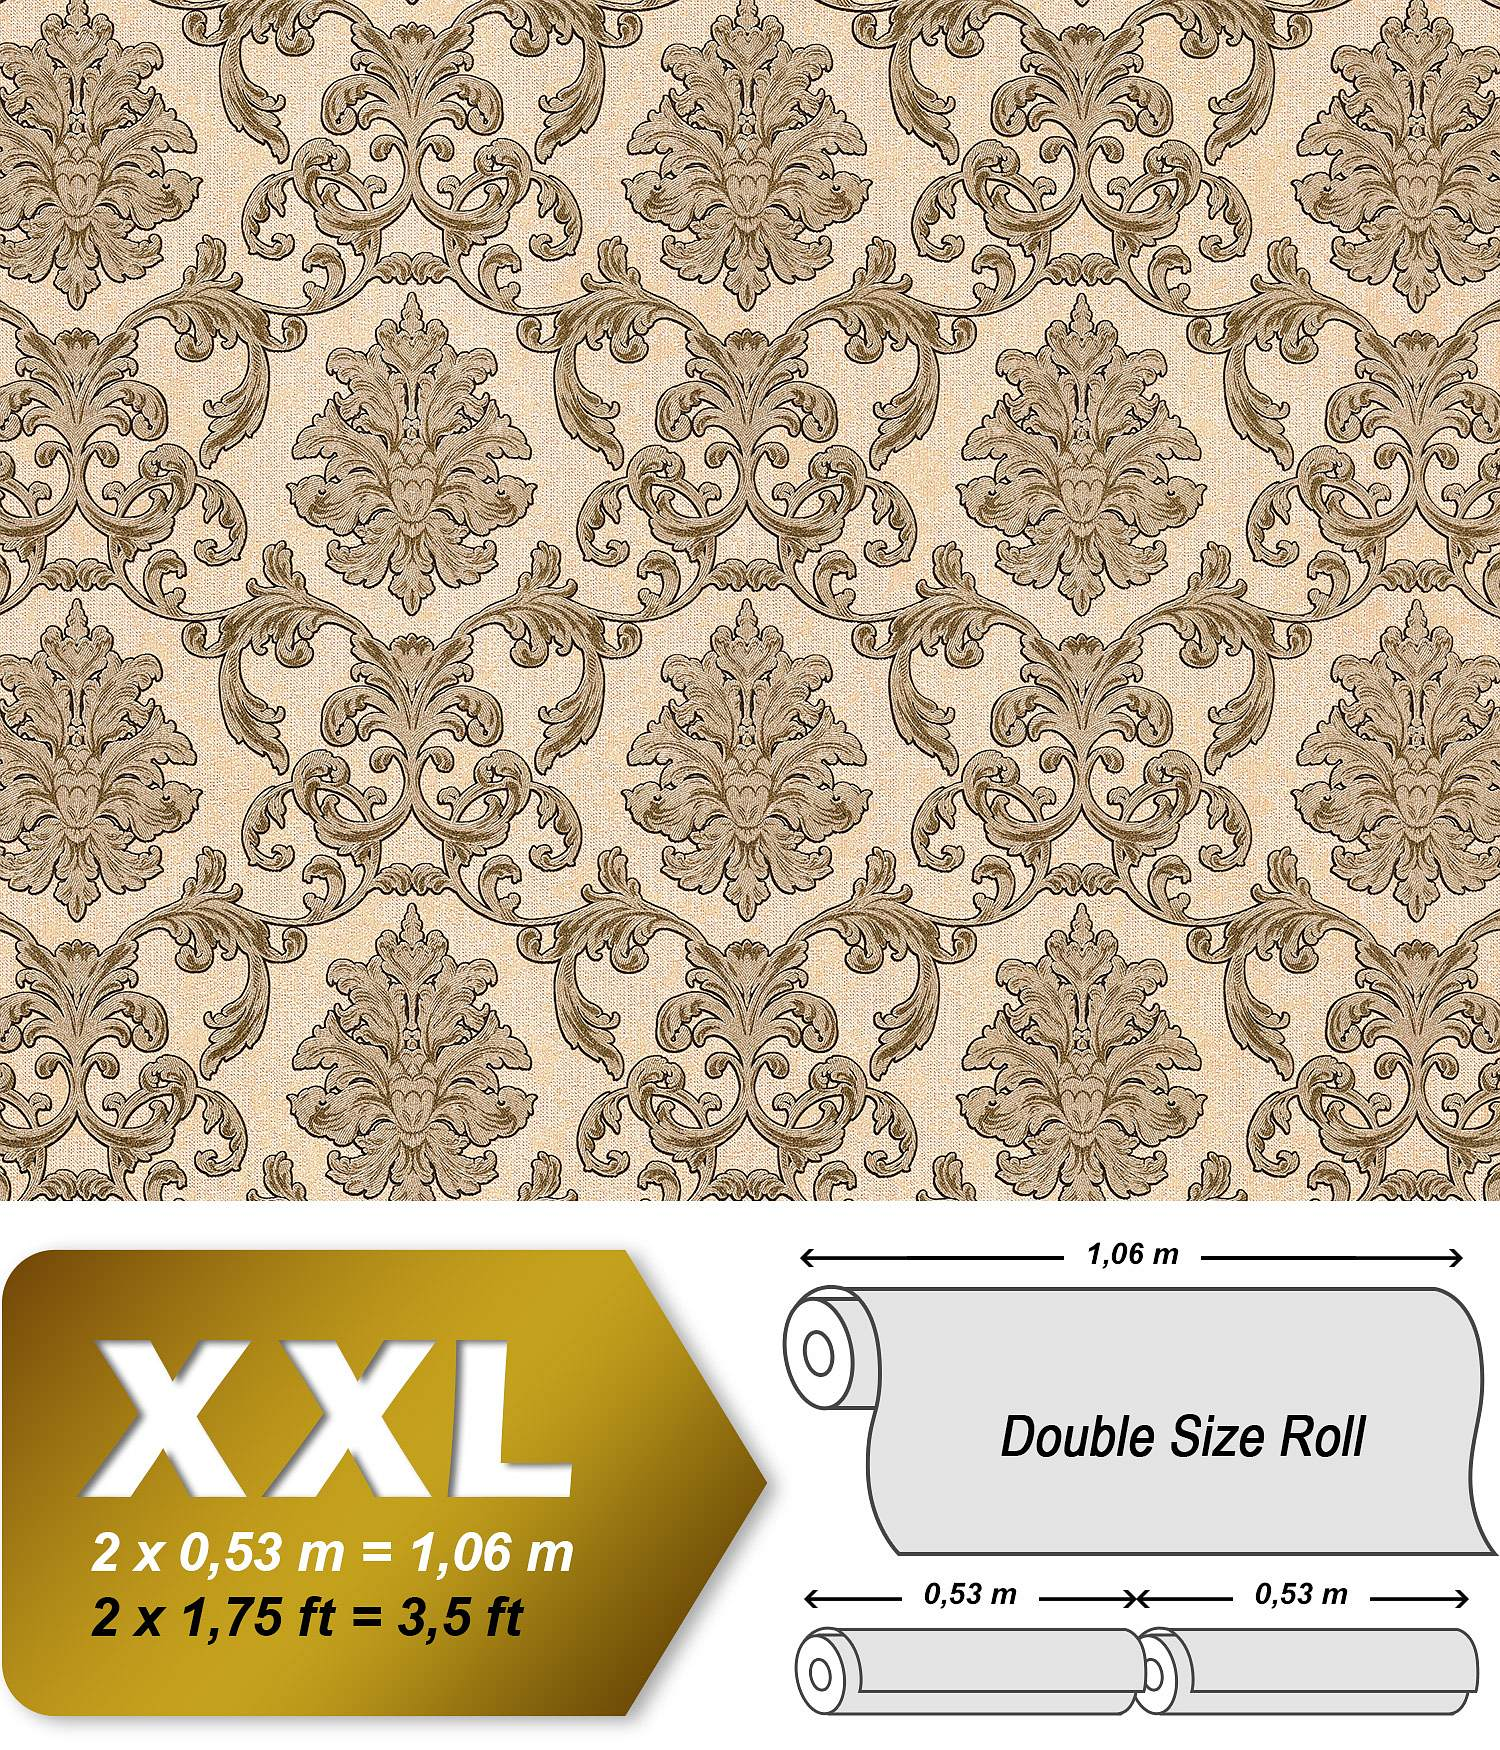 barock tapete edem 6001 91 vliestapete gepr gt mit ornamenten glitzernd creme beige gold 10 65. Black Bedroom Furniture Sets. Home Design Ideas